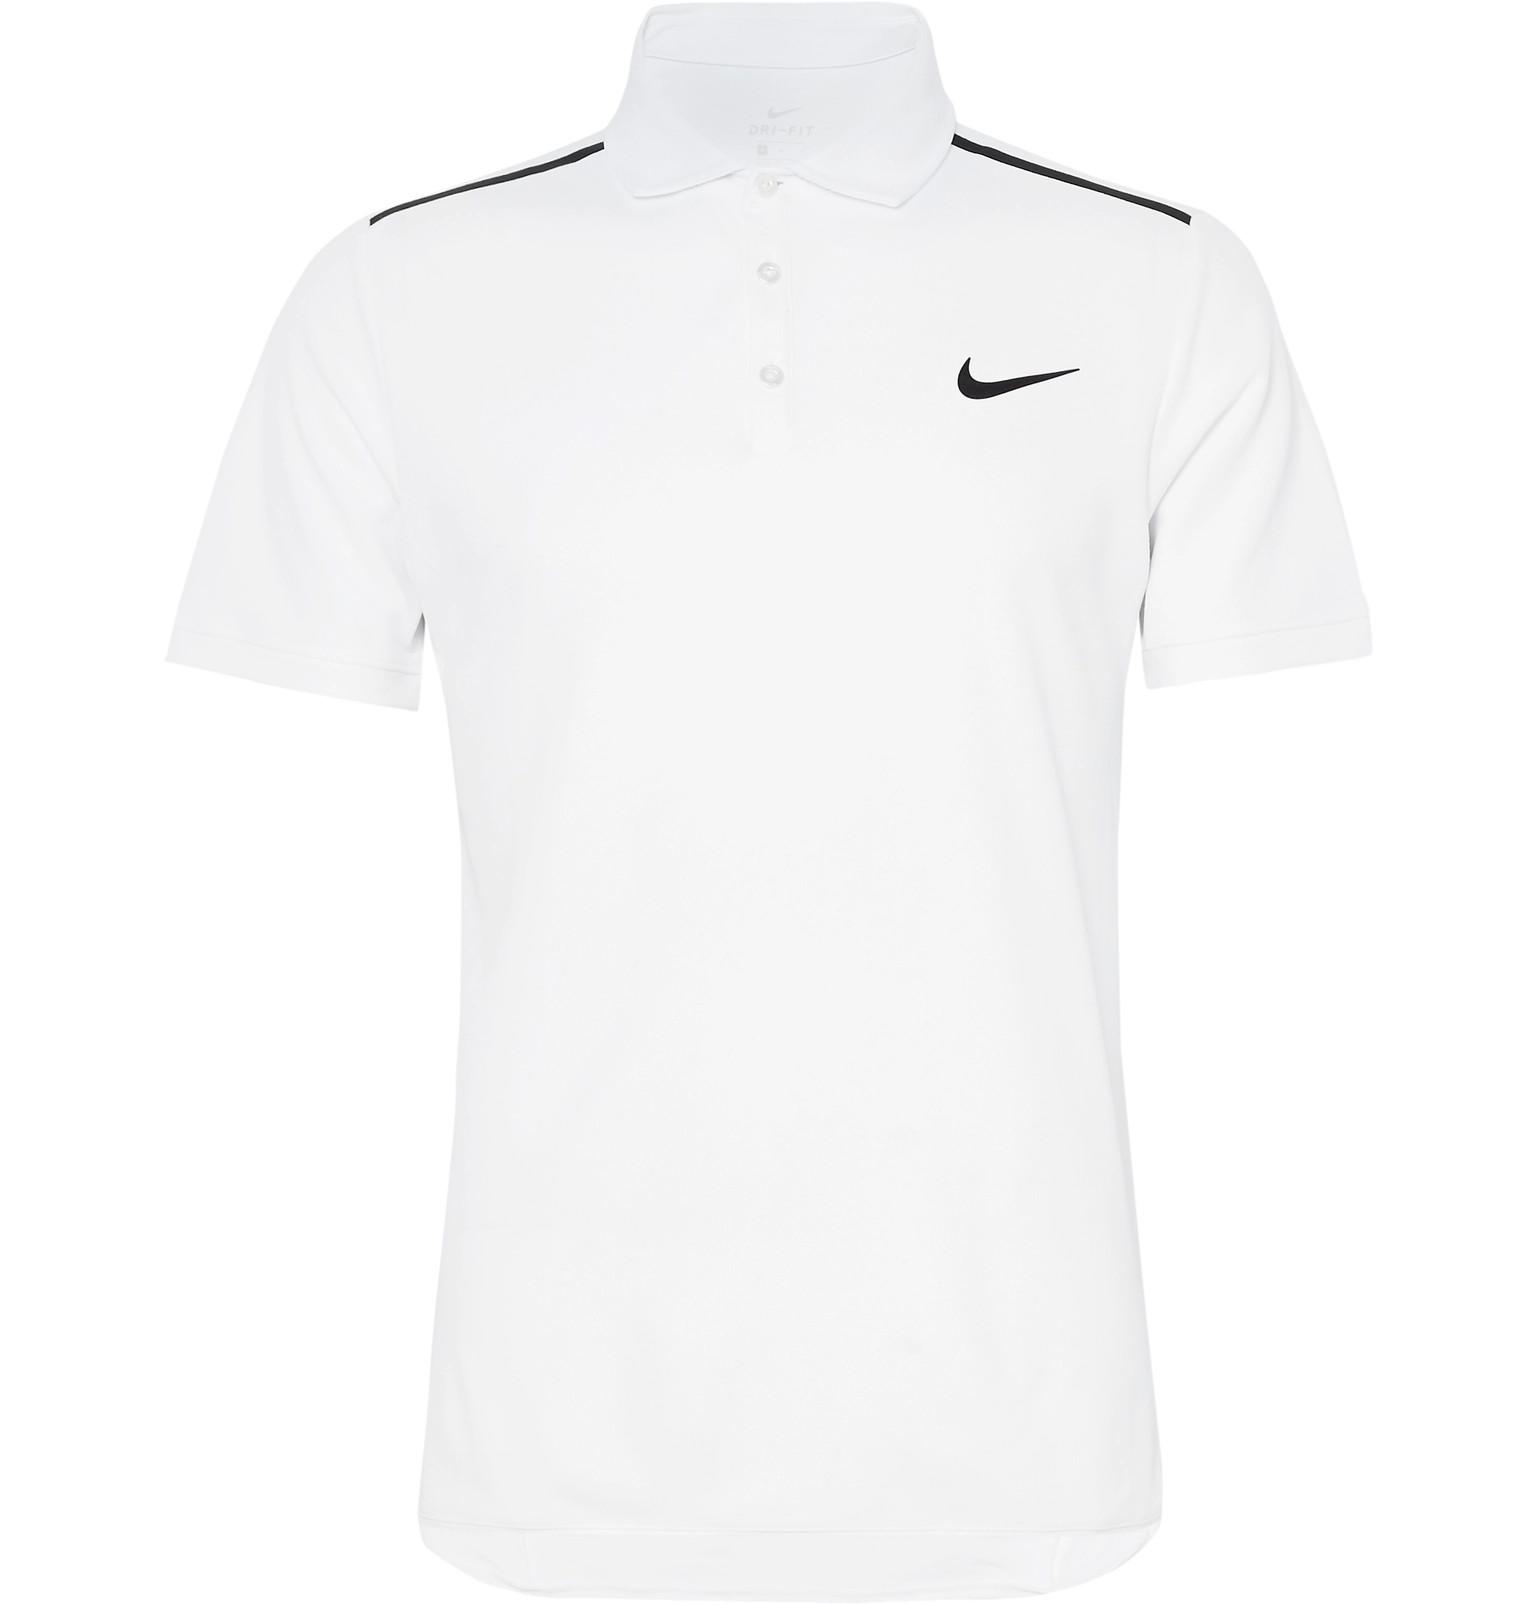 cde62011eea nike-white-Nikecourt-Dry-Advantage-Dri-fit-Pique-Tennis-Polo-Shirt.jpeg